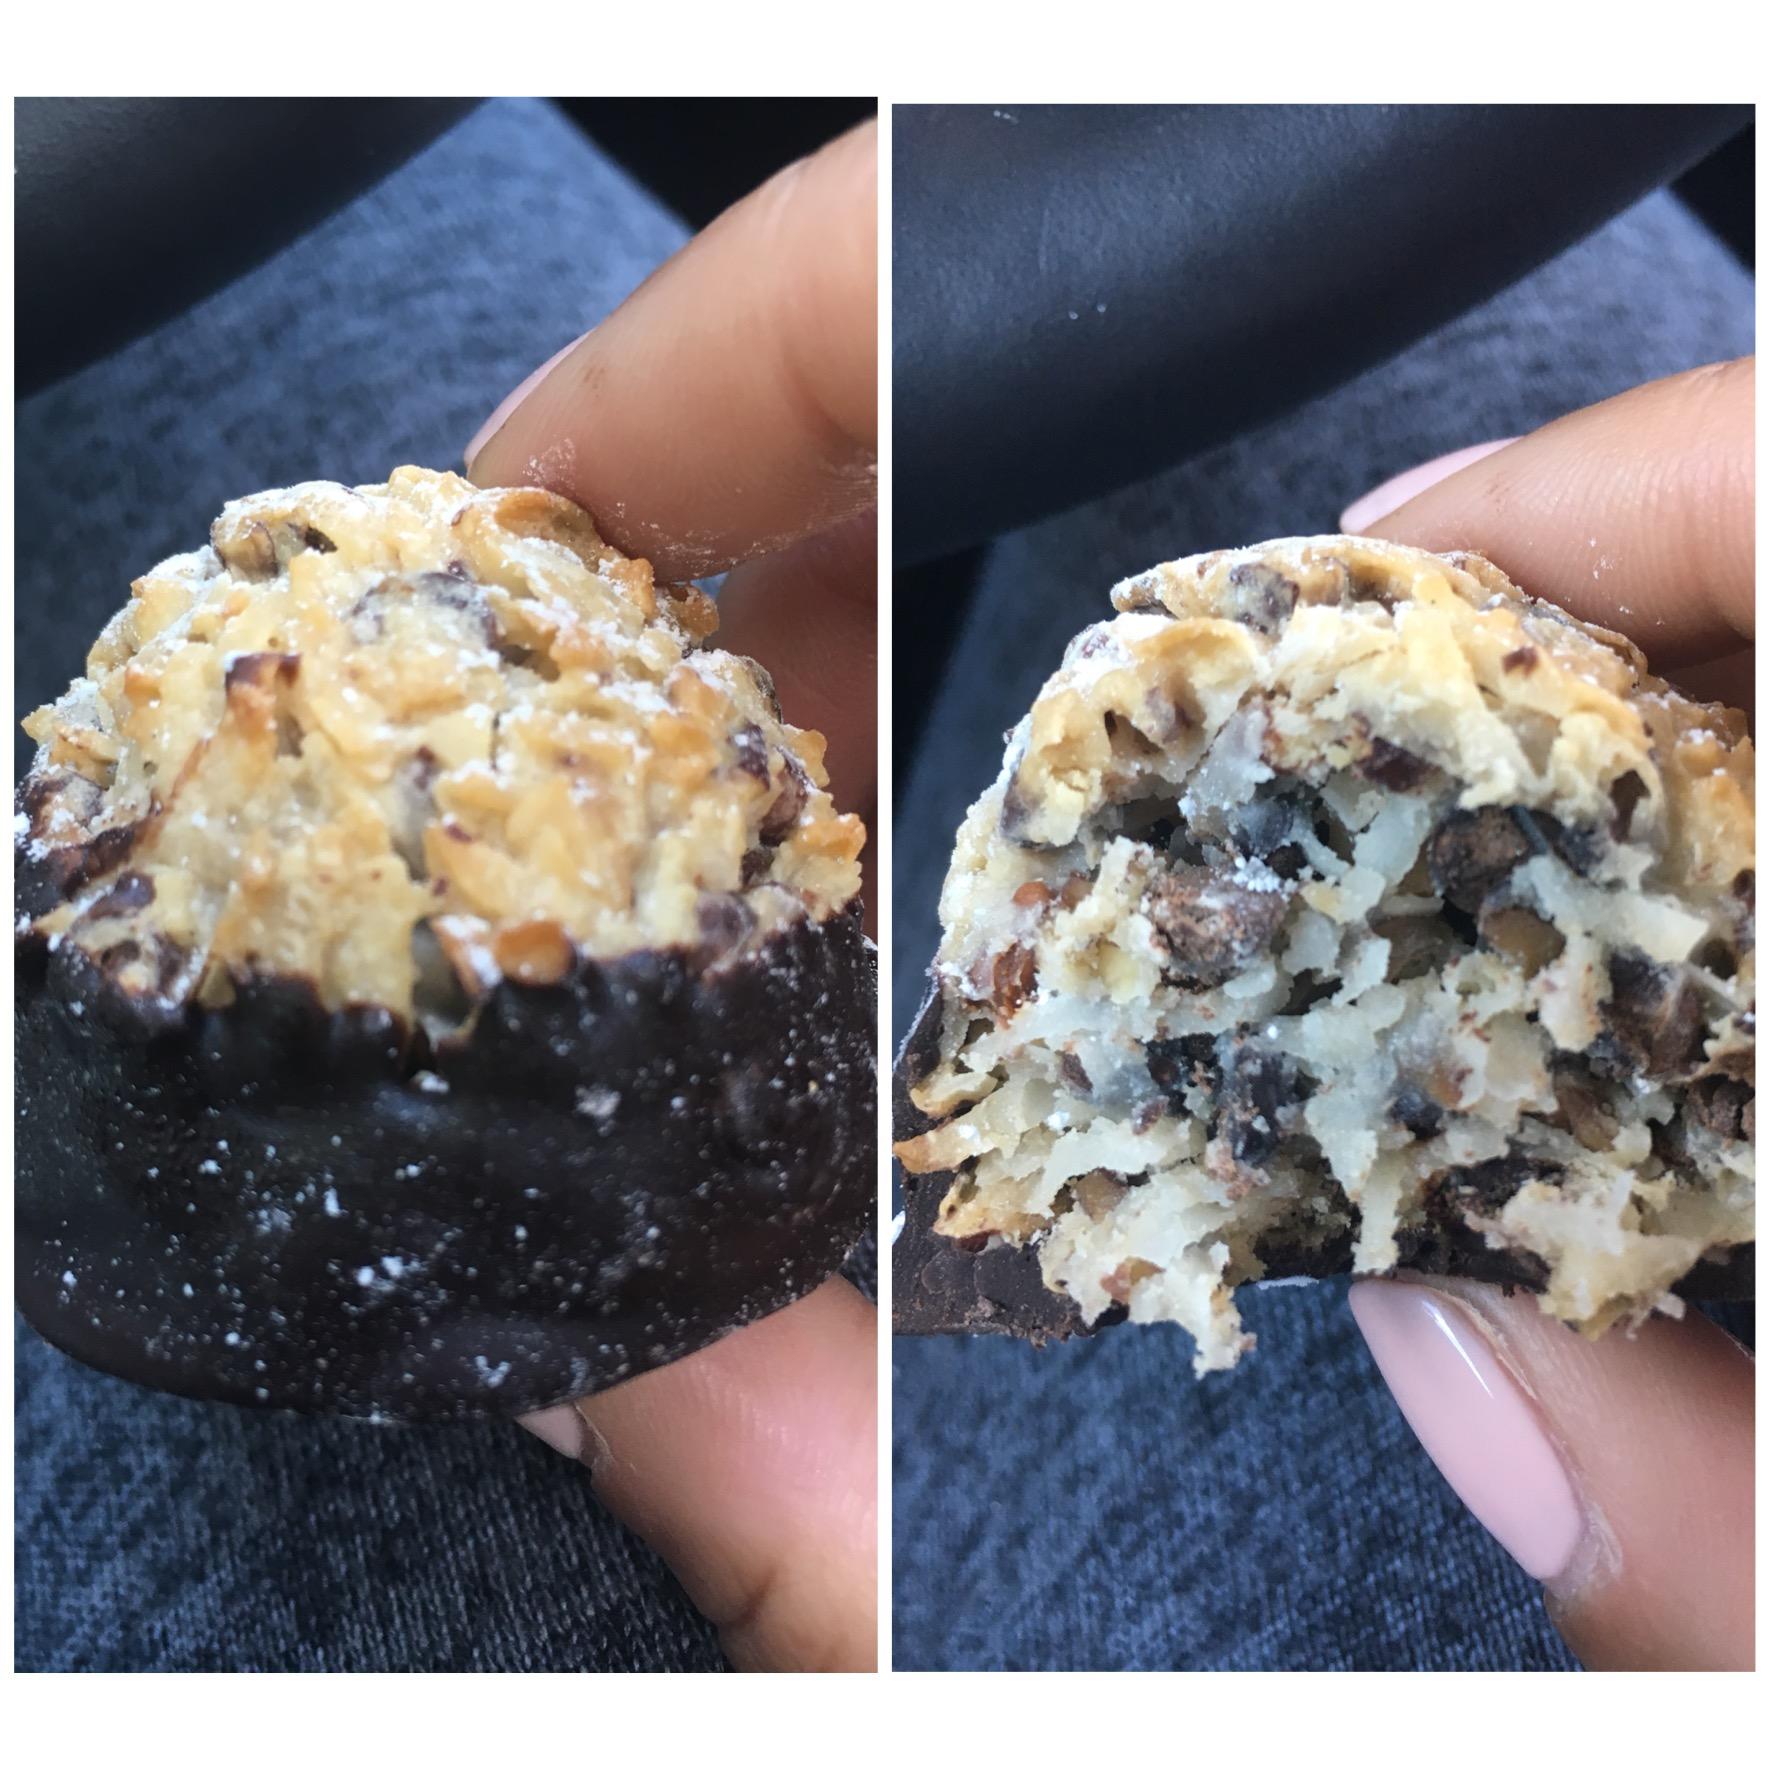 Dark Chocolate Coconut Macaroon - Ooh La La The Dessert Boutique, Houston, TX